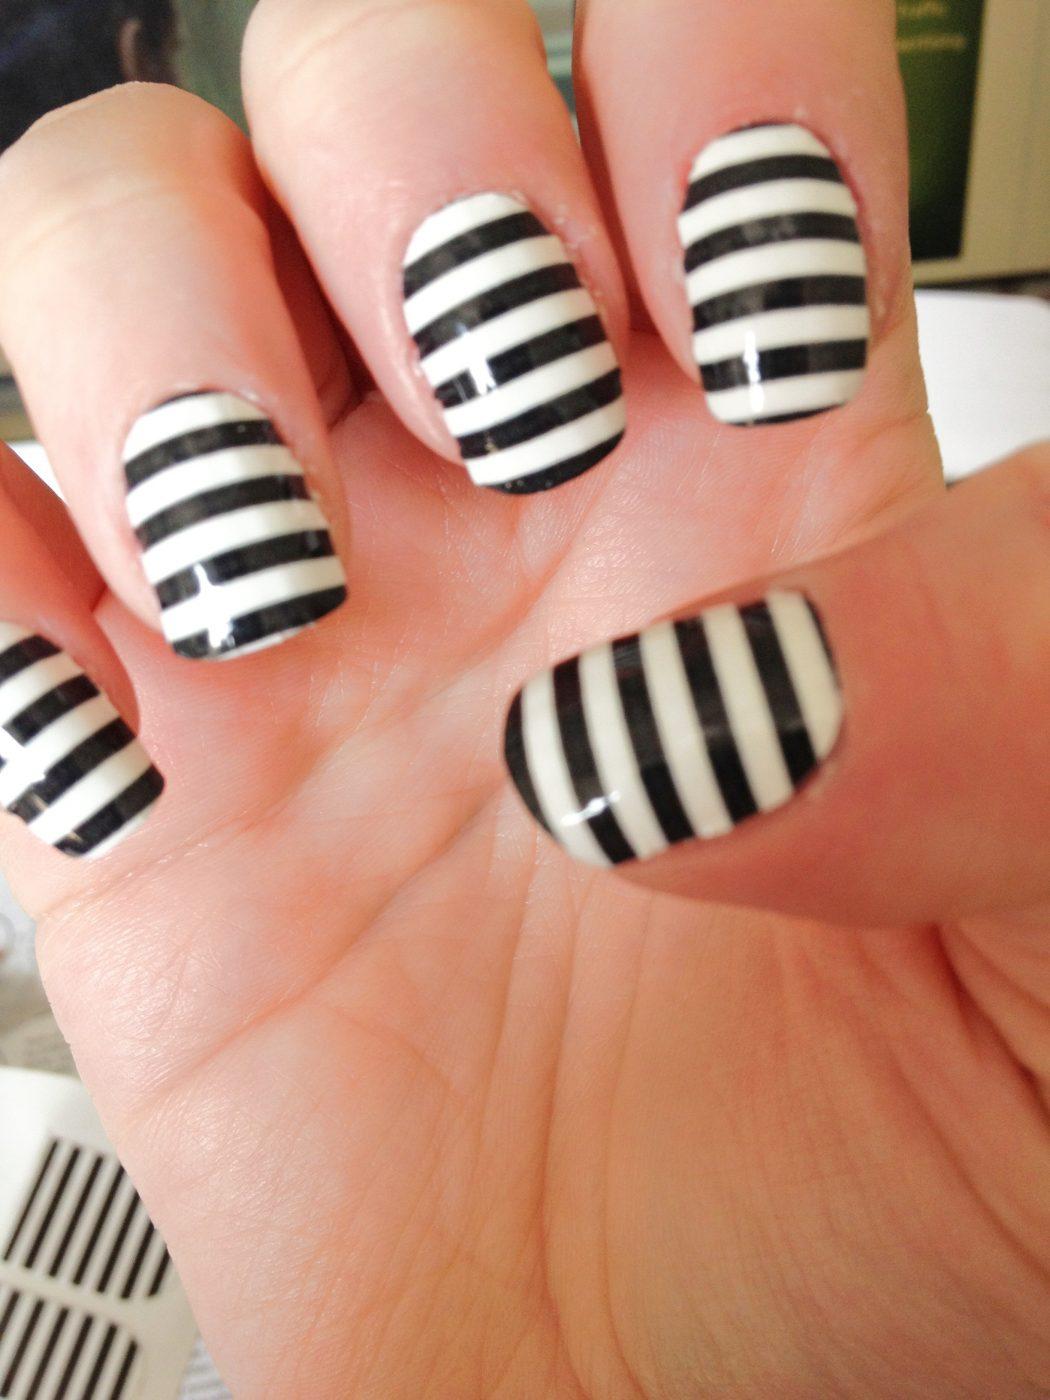 72f62548ceb6919c9381c6839d728ae7 50+ Coolest Wedding Nail Design Ideas